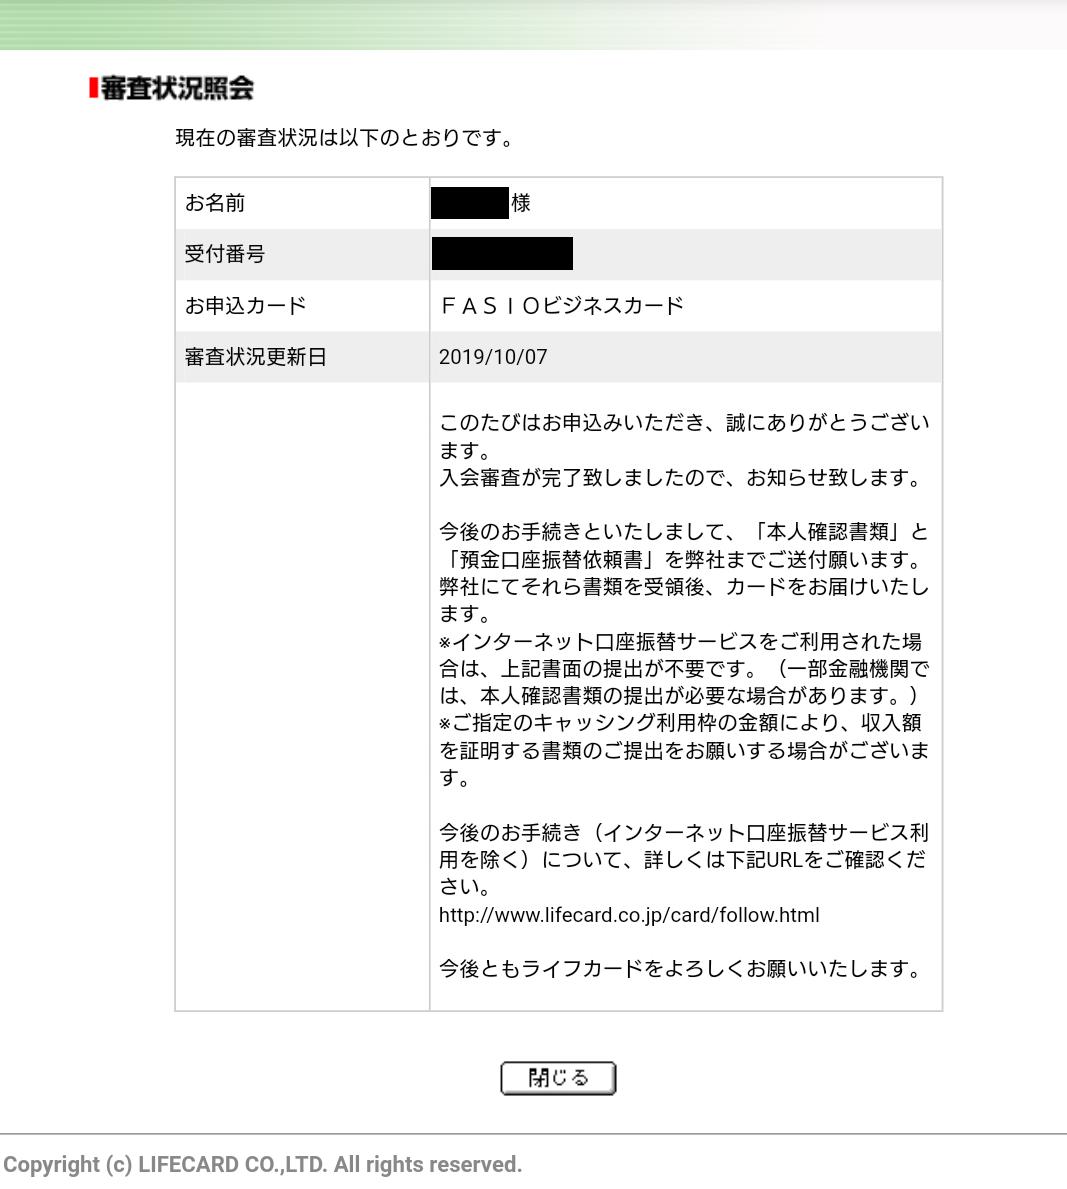 f:id:yotsumao:20191117214211p:plain